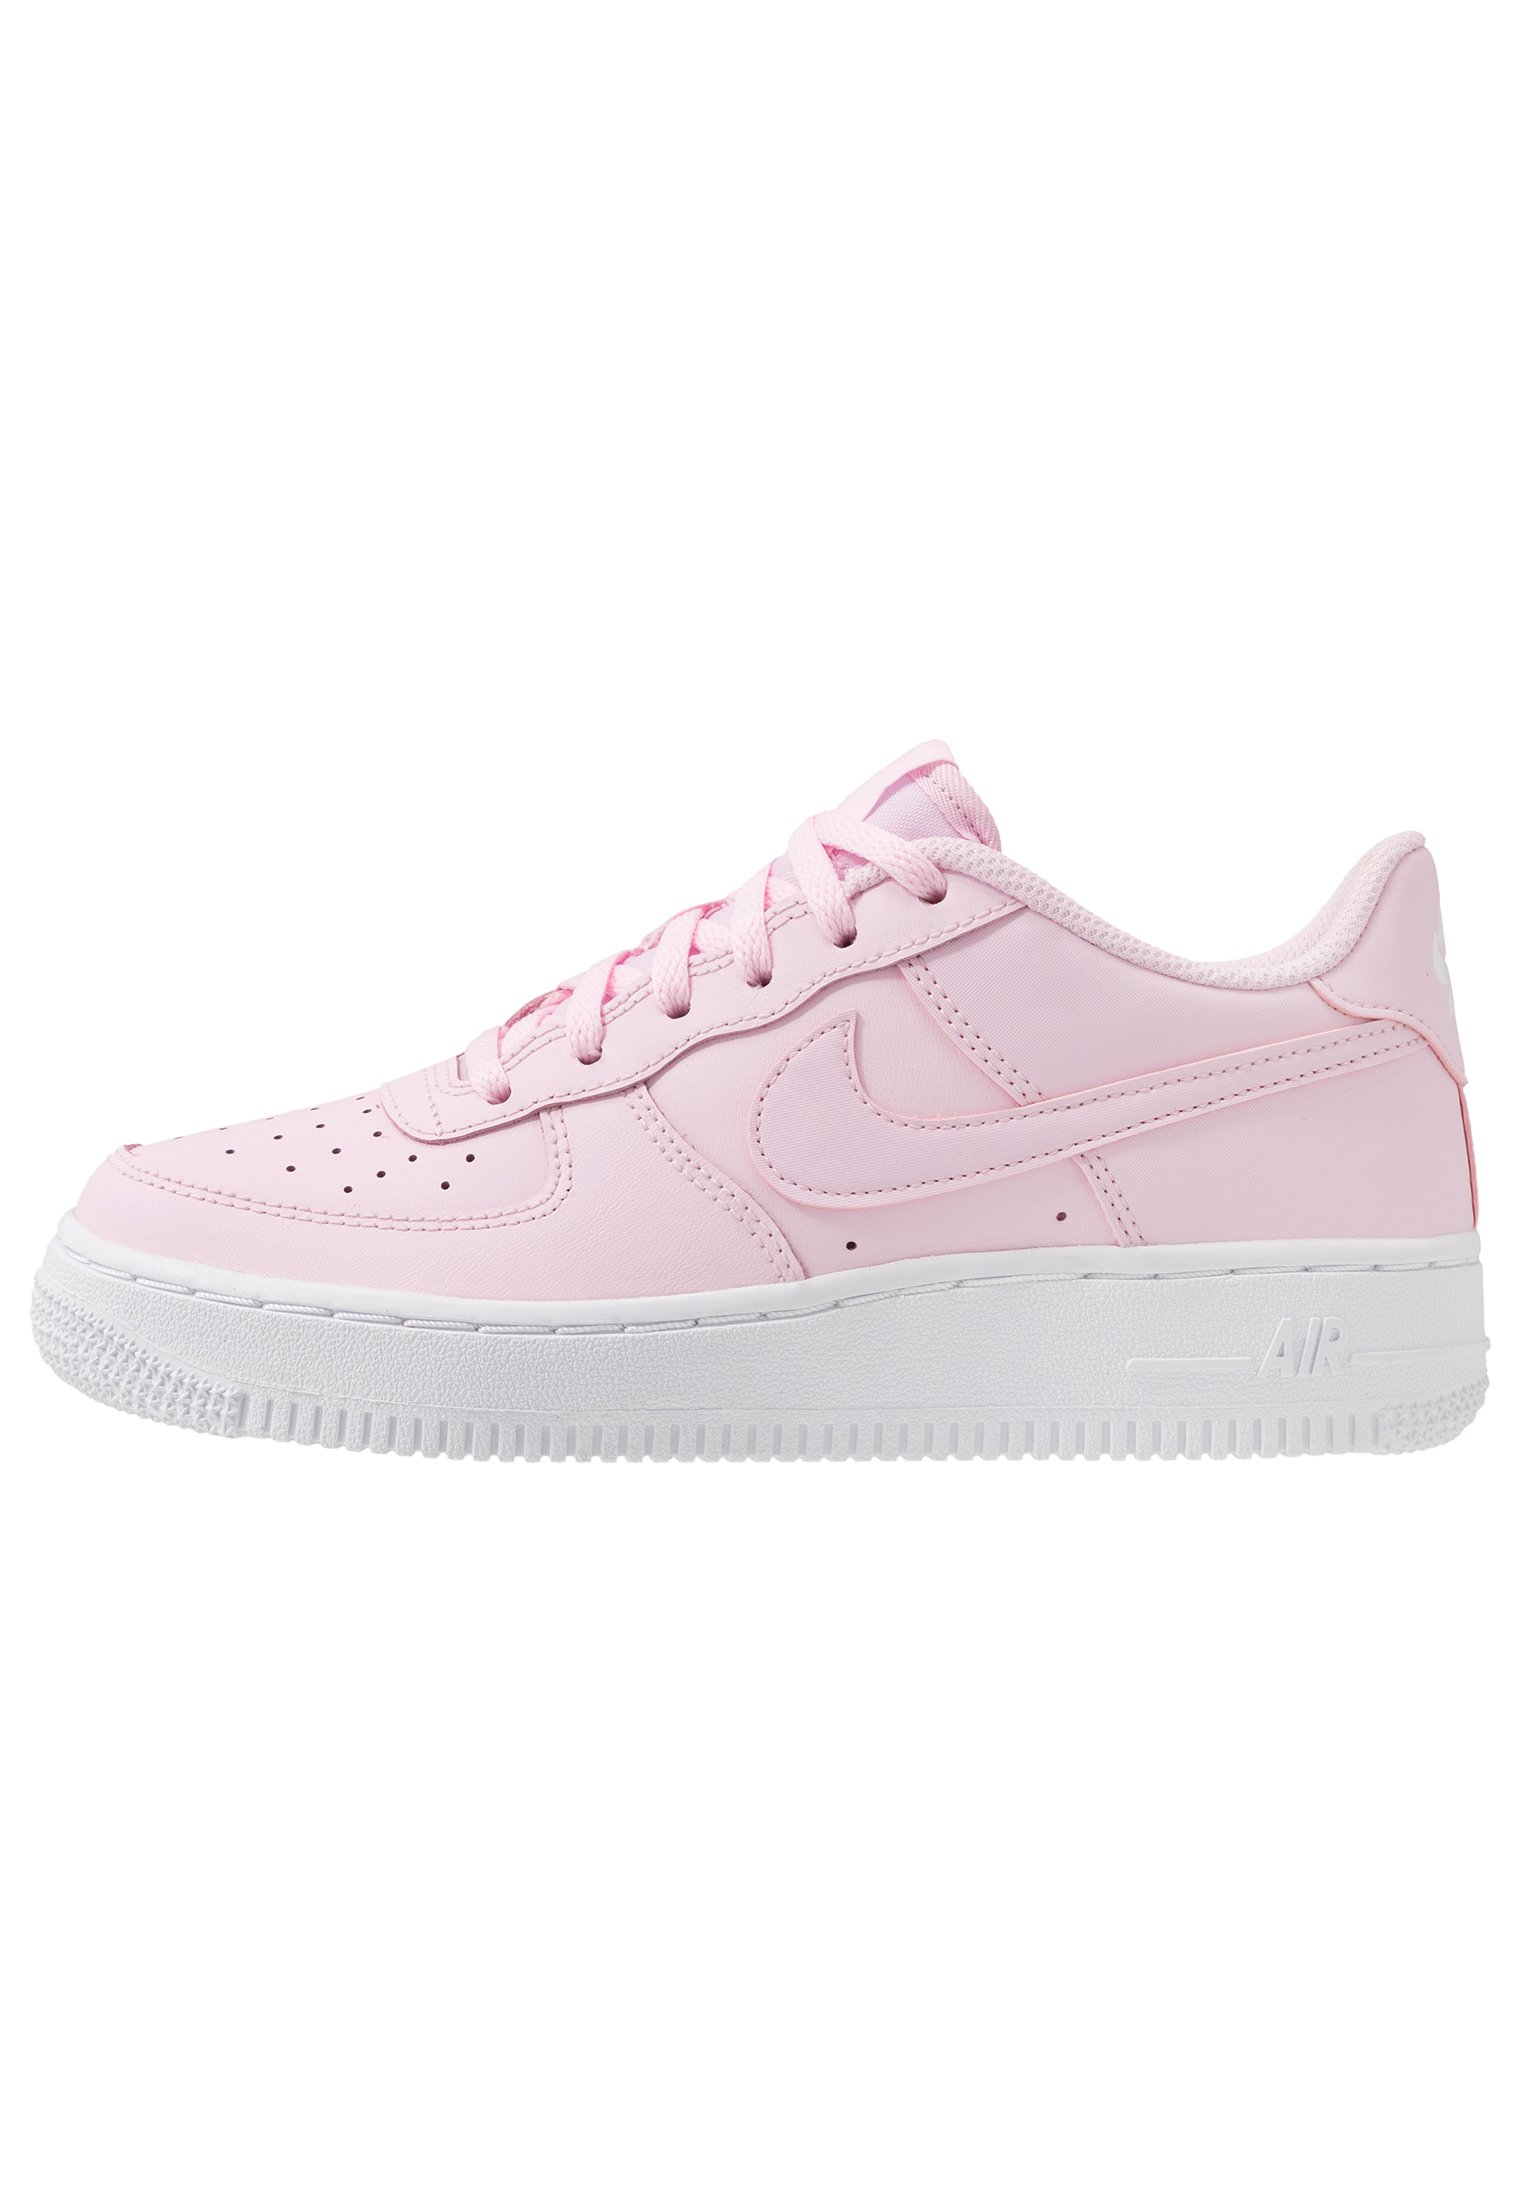 Nike Sportswear AIR FORCE 1 - Baskets basses - rose/blanc - ZALANDO.FR